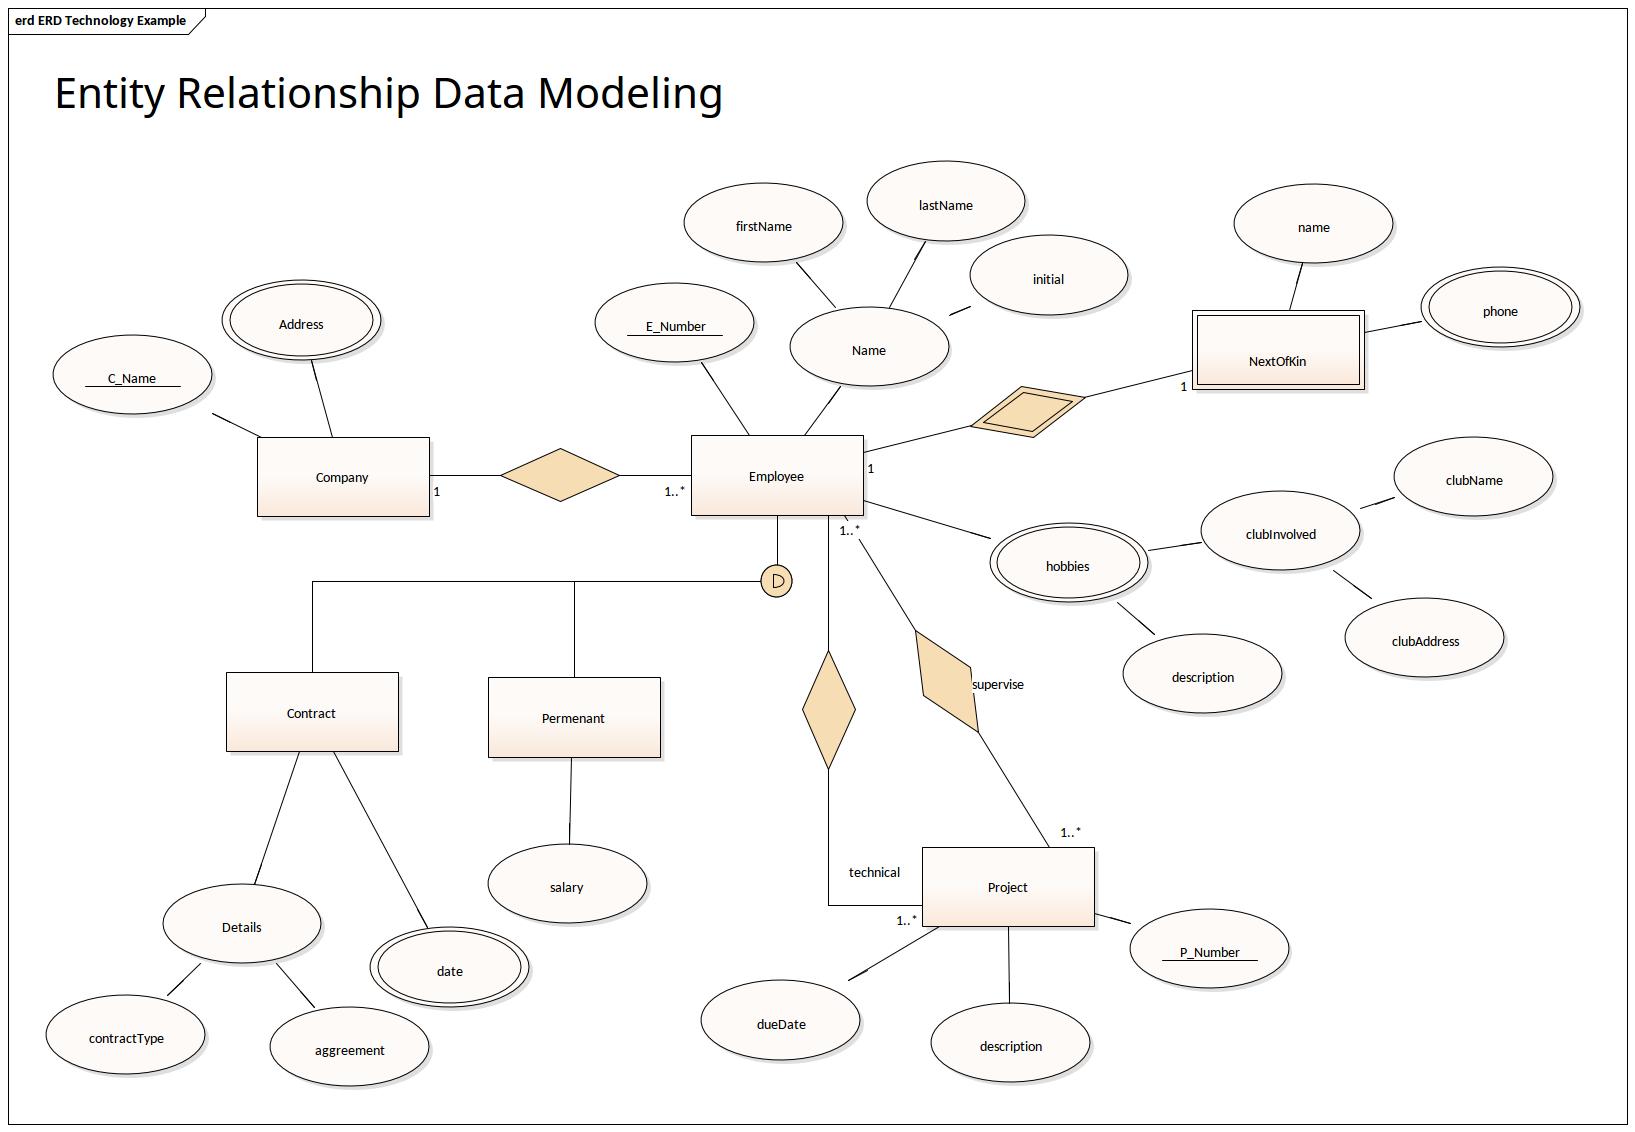 Entity Relationship Data Modeling | Enterprise Architect for Er Model Diagram